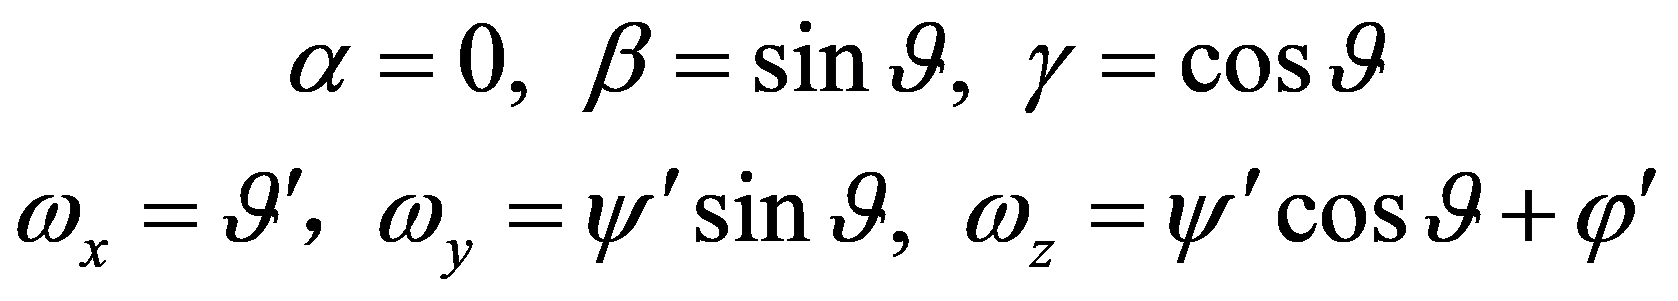 稳定性4.png